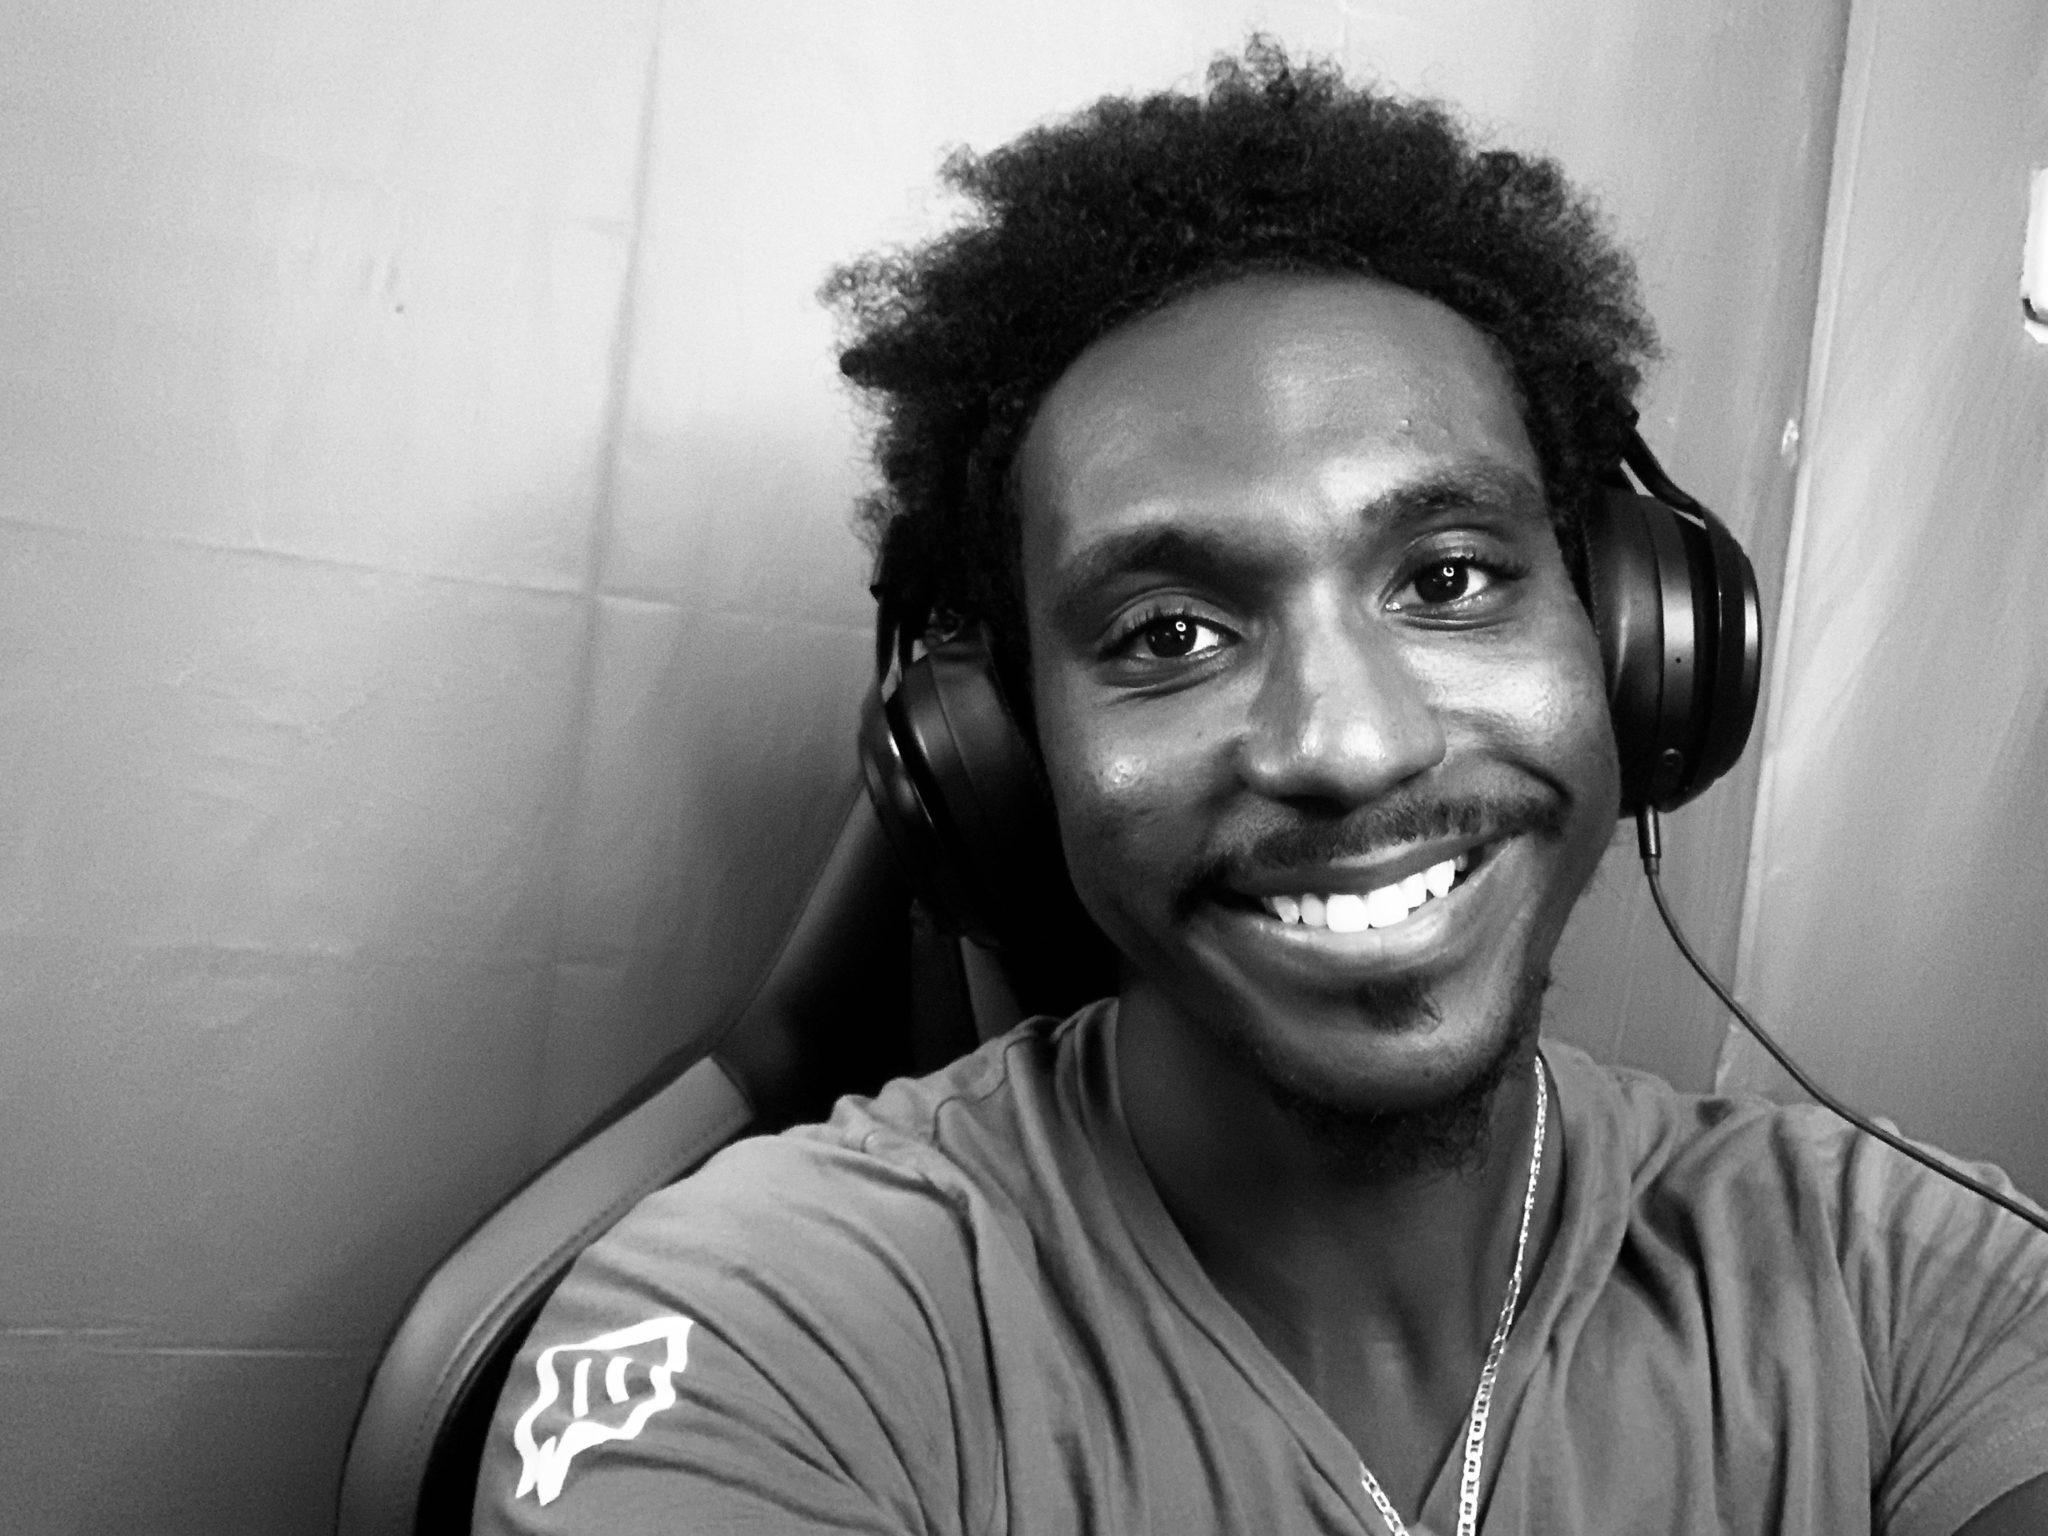 Twitch streamer StreetGrind